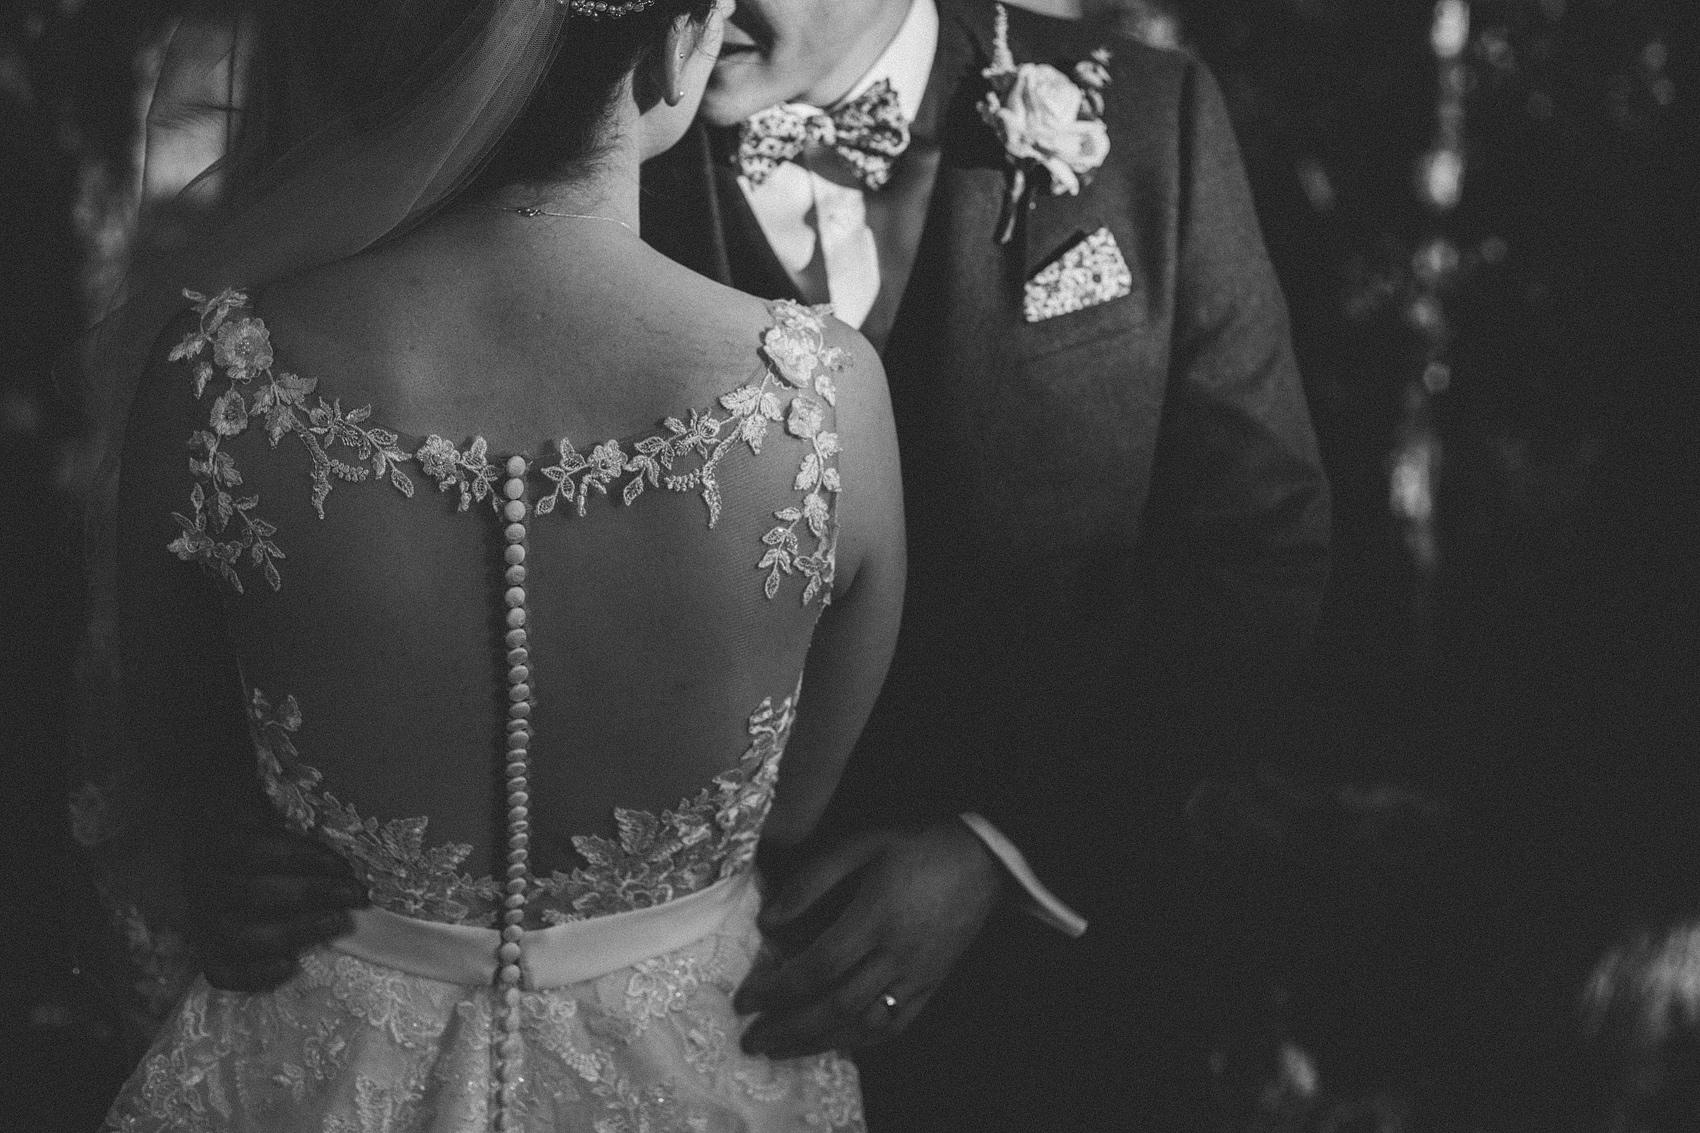 Dilhorne_Village_Hall_Wedding_Photography_-_82_.jpg